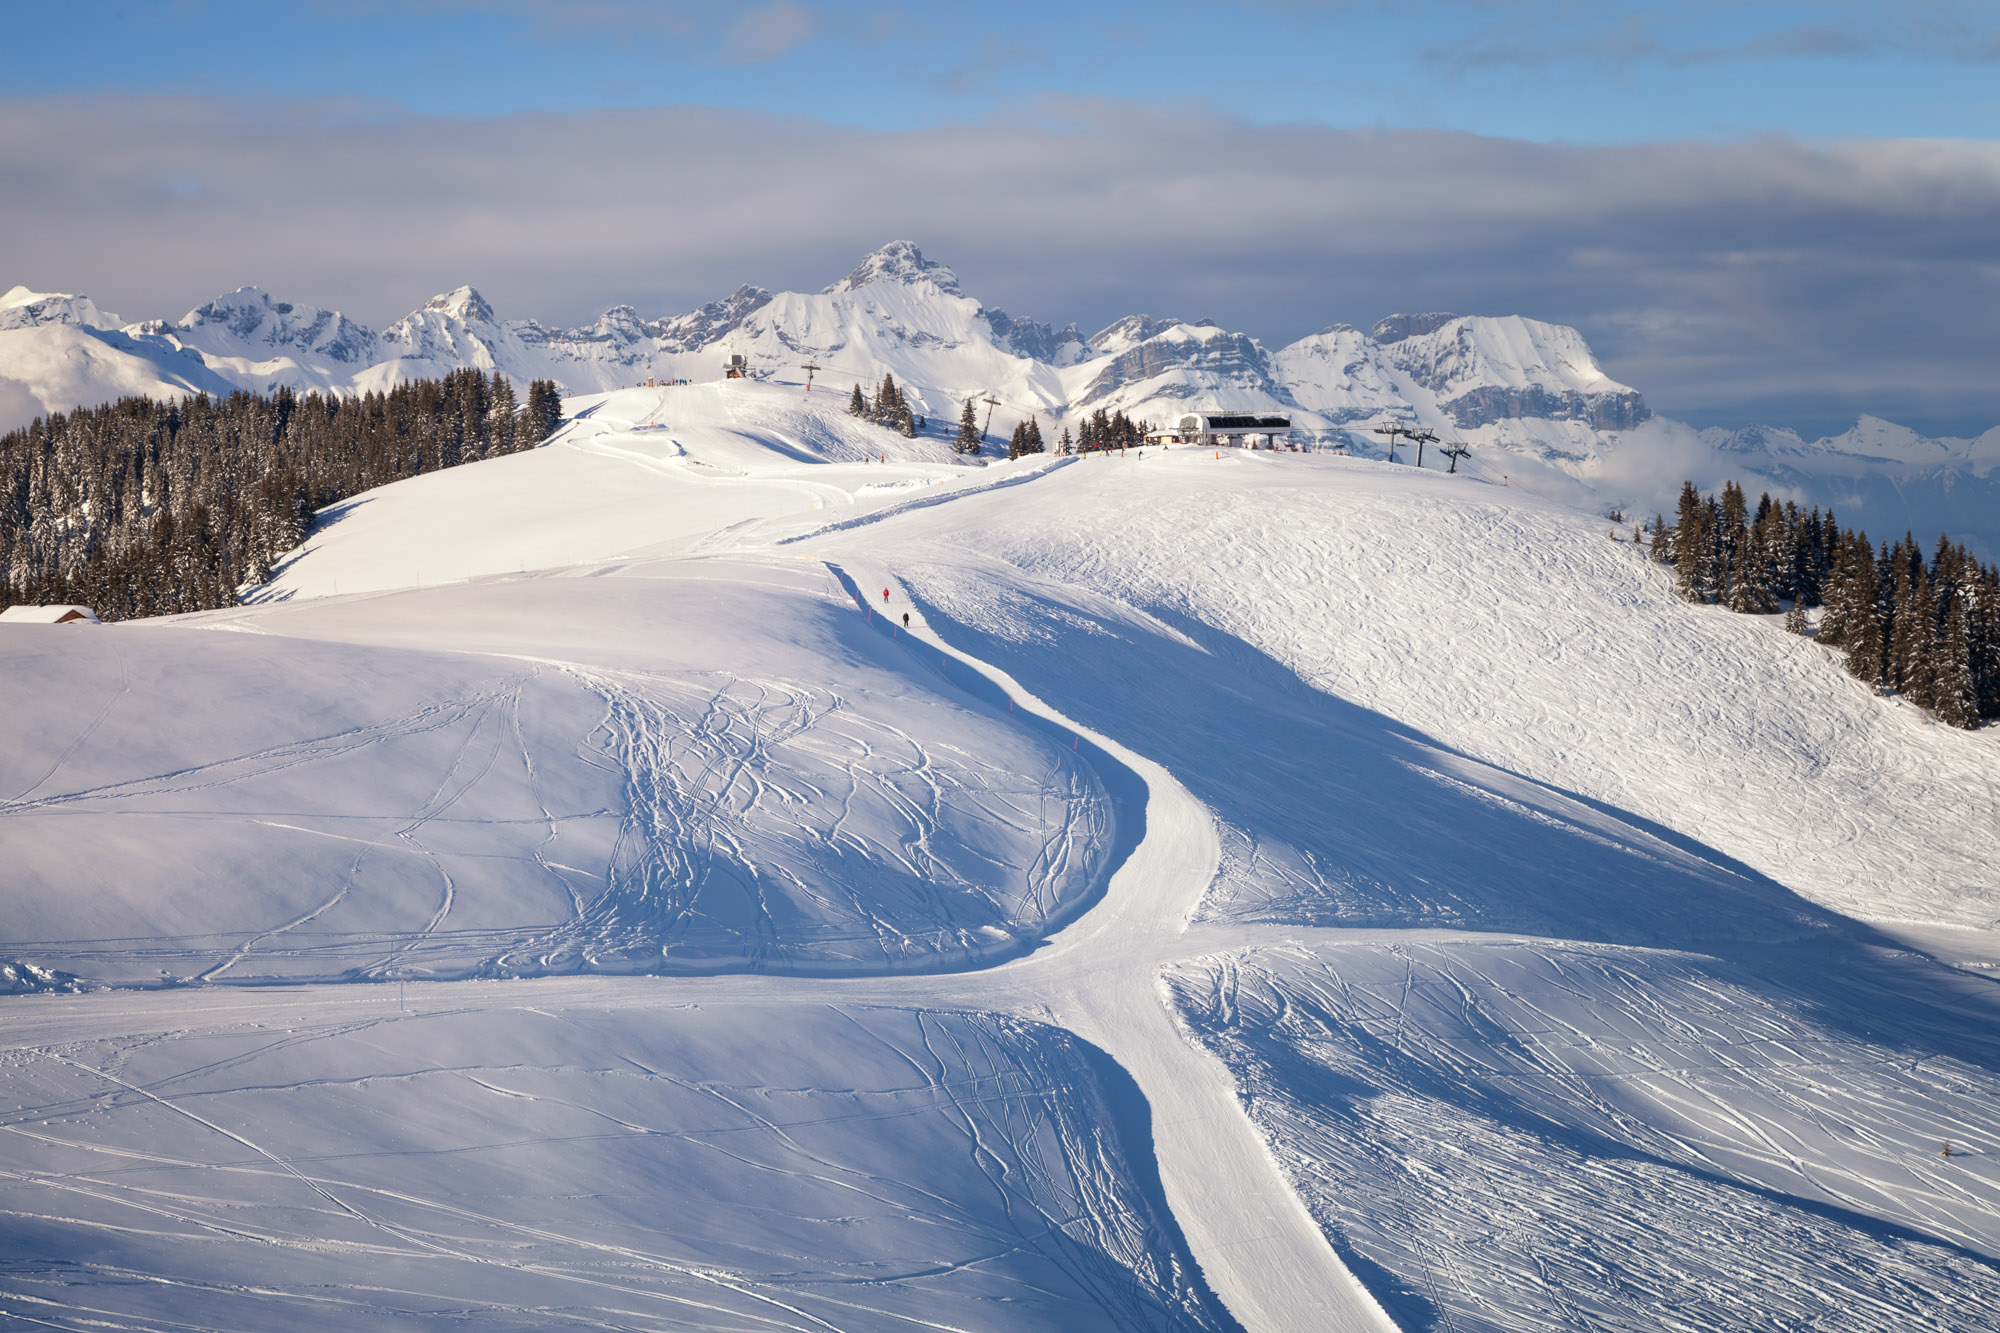 Ski Slopes in Megeve, France